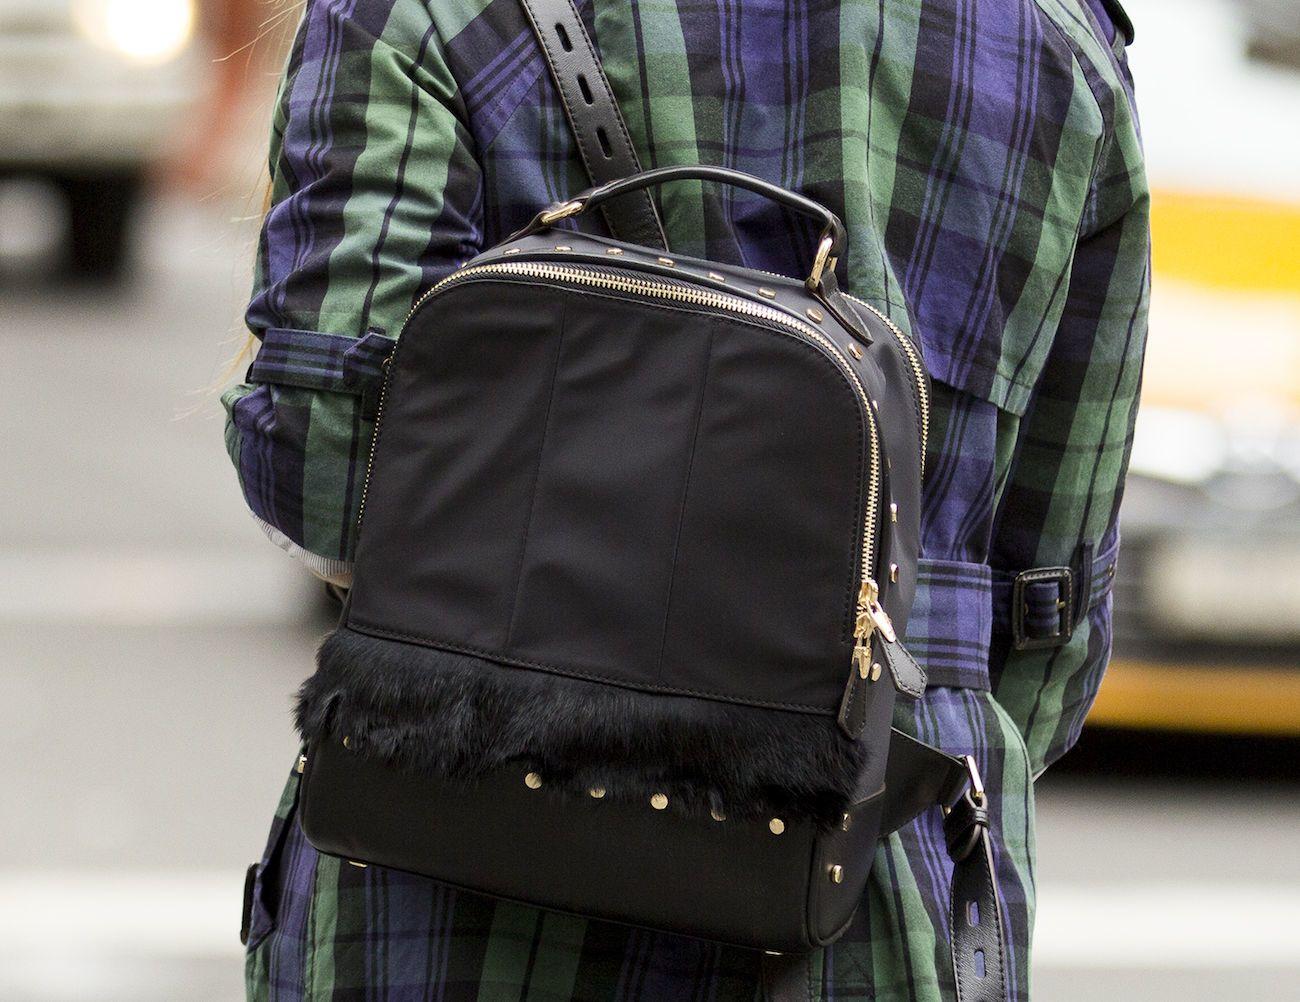 Hebe Rose Stylish Recycled Handbags